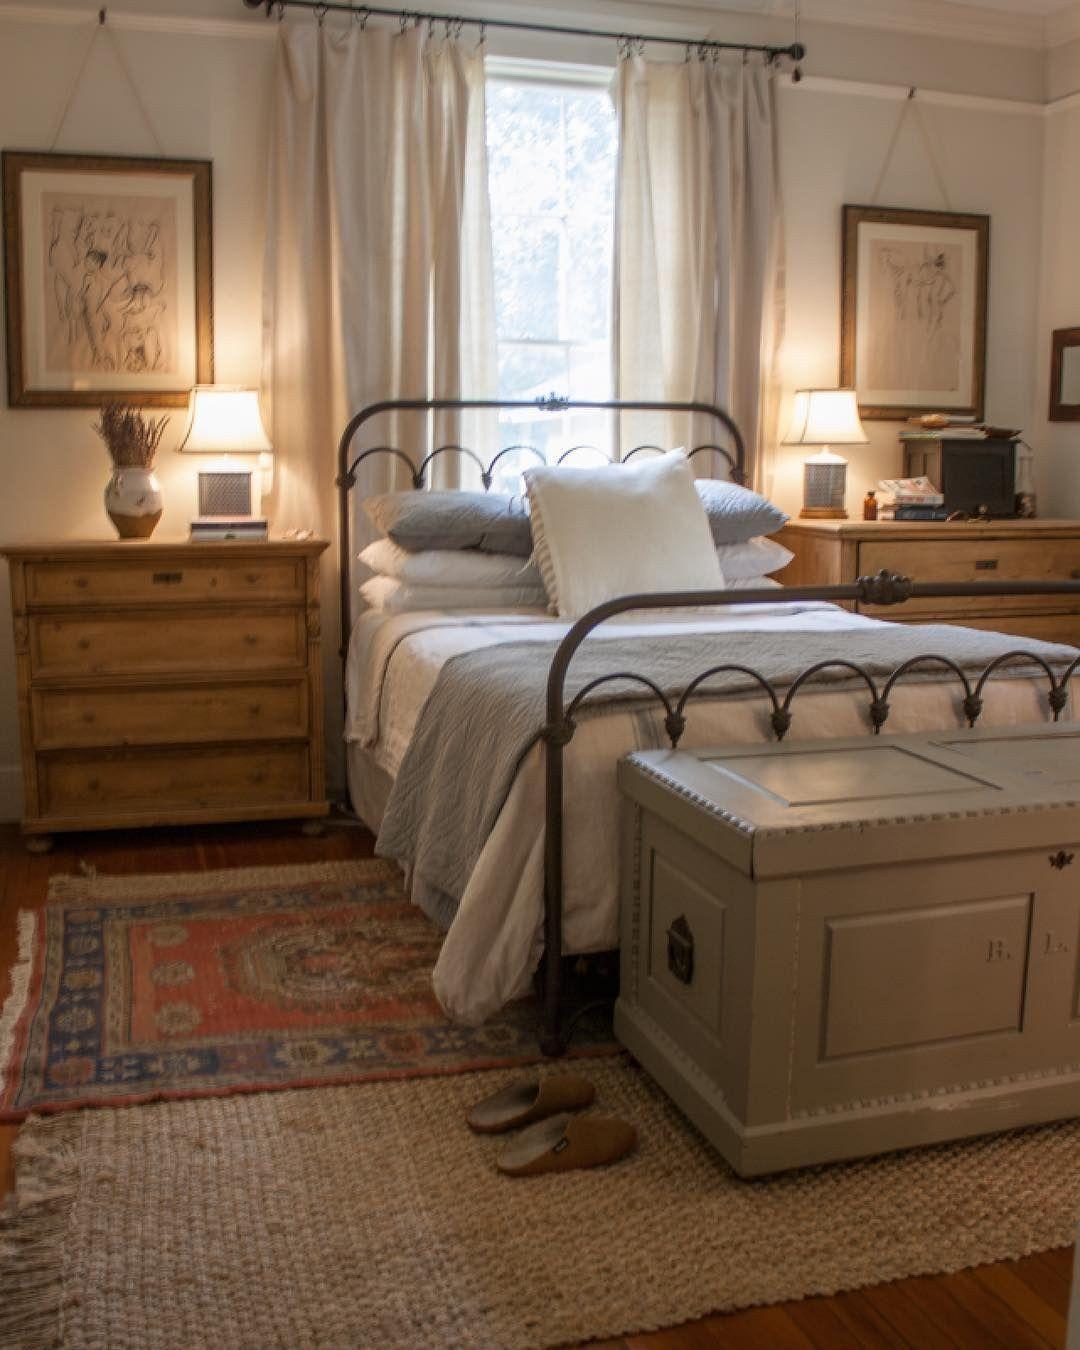 Hgtv Bedrooms Decorating Ideas Pretty Erin Napier Design